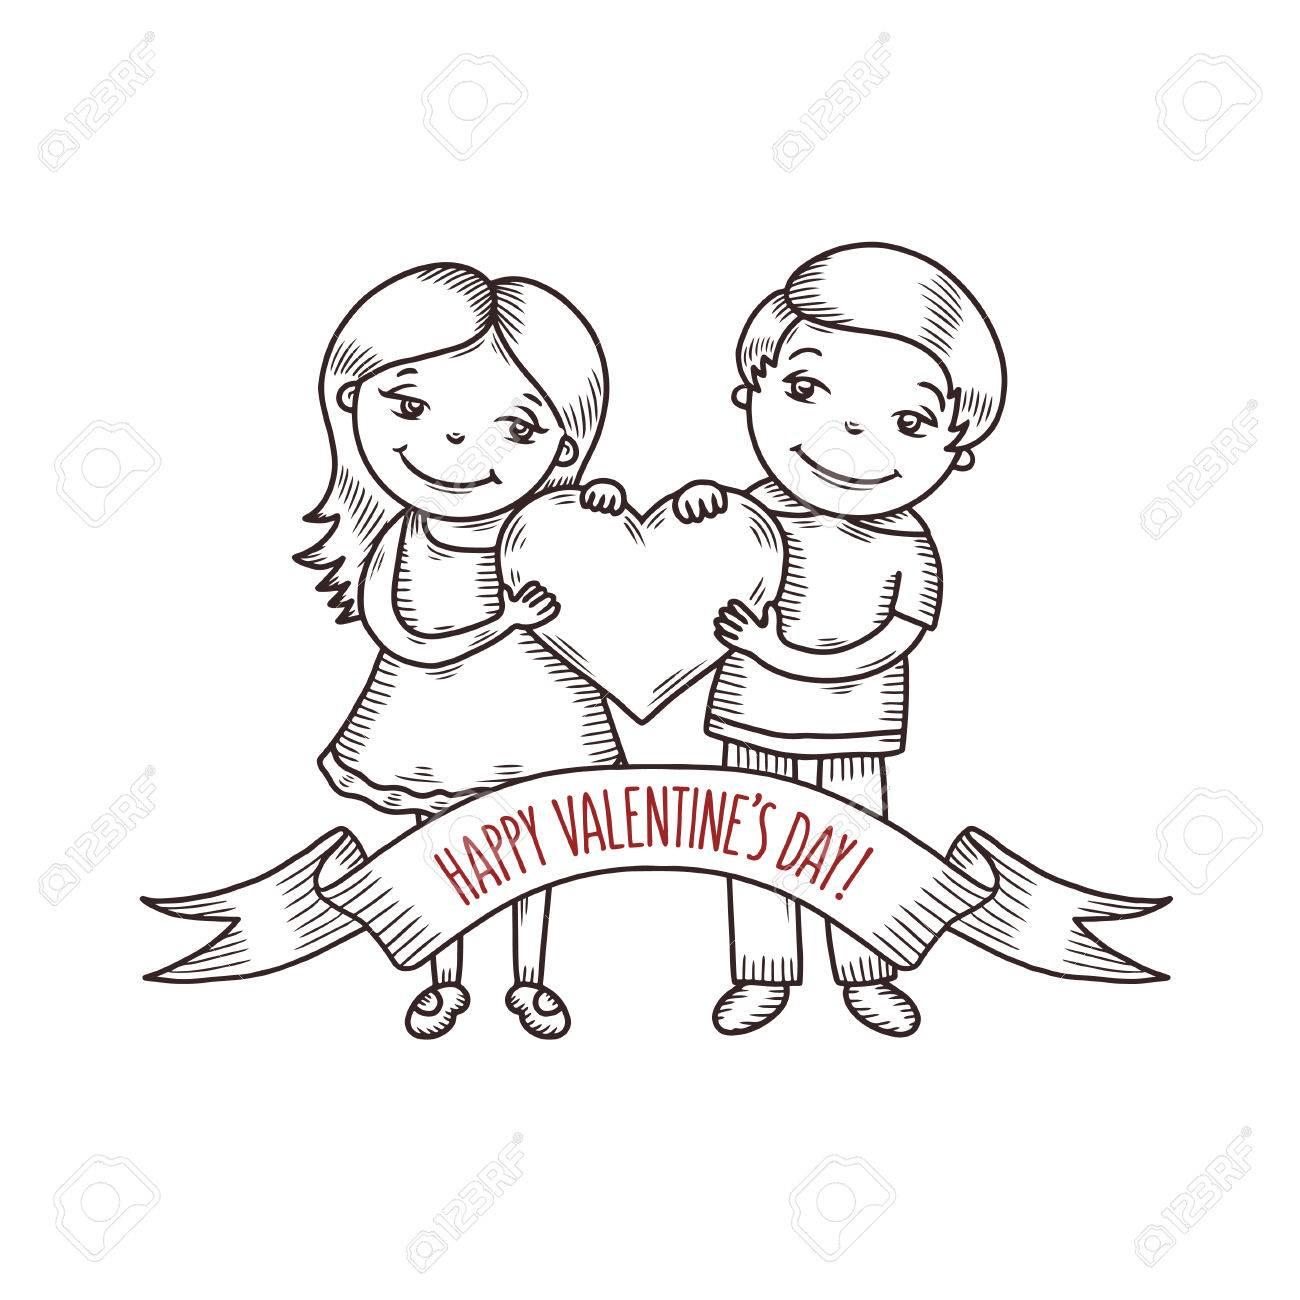 1300x1300 Valentine Day Greeting Card Hand Drawn Boy And Girl